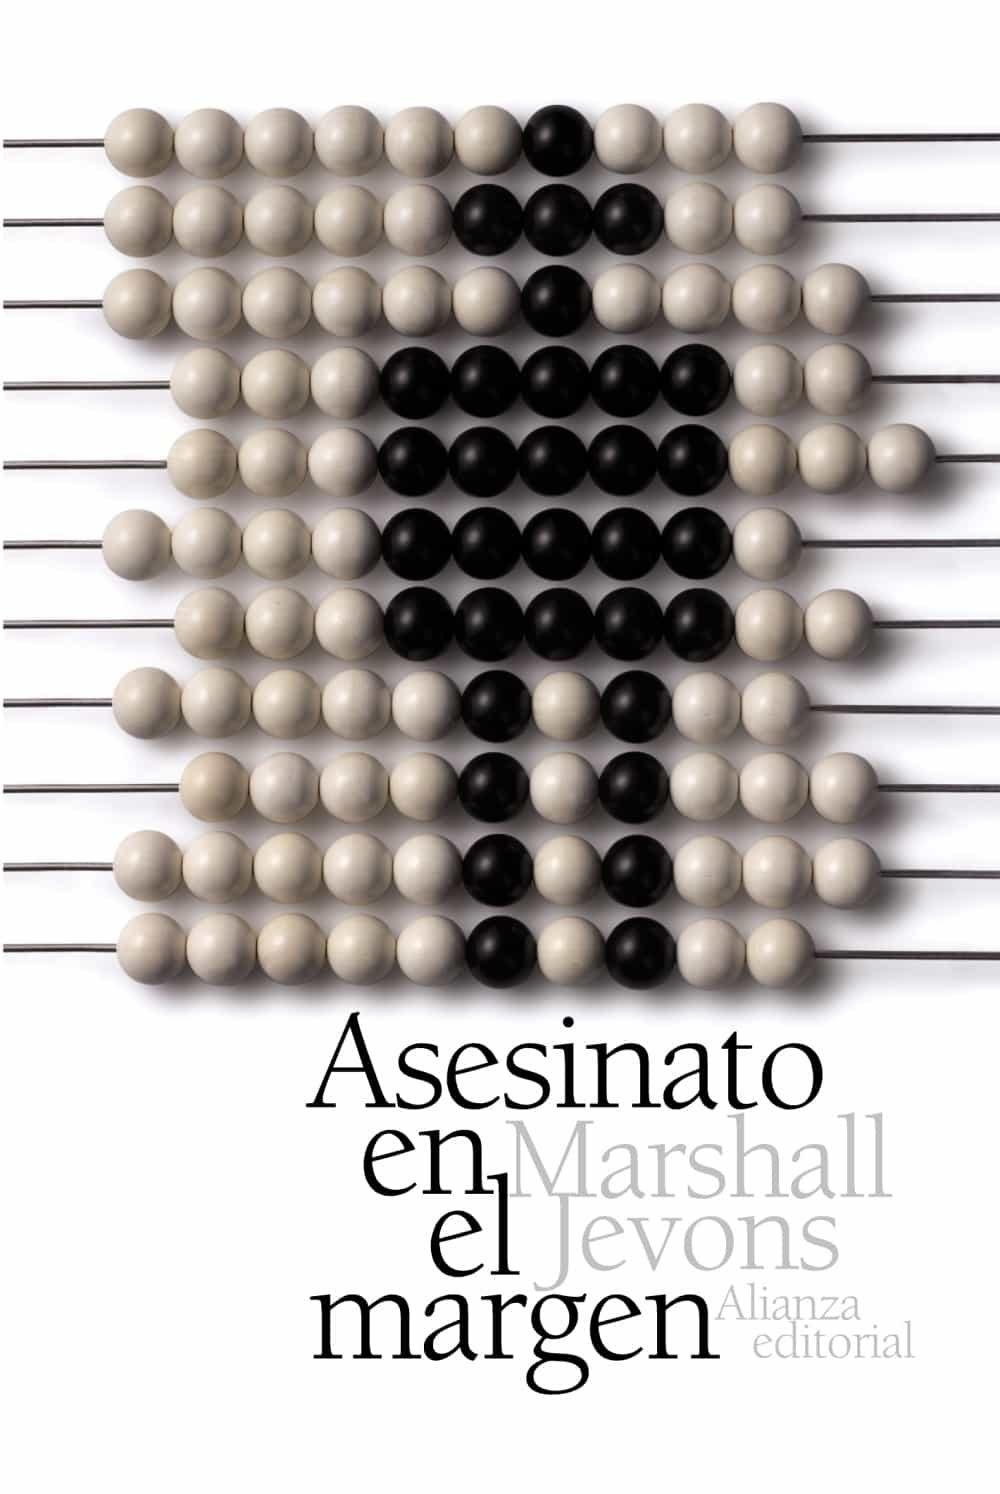 ASESINATO EN EL MARGEN   MARSHALL JEVONS   Comprar libro 9788420661247